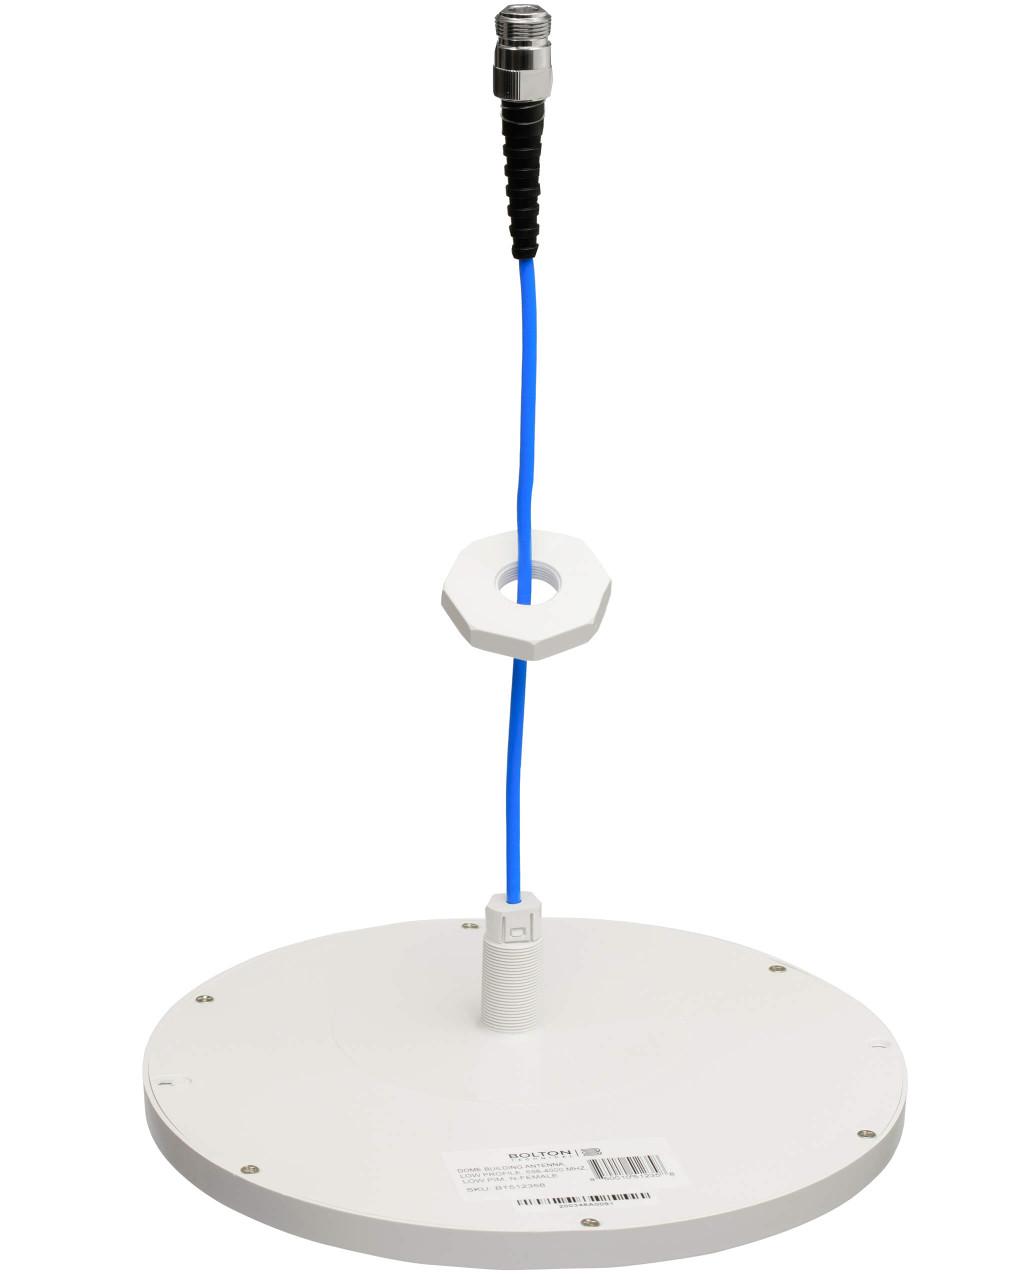 The Rondo 5G - Low Profile Dome Antenna